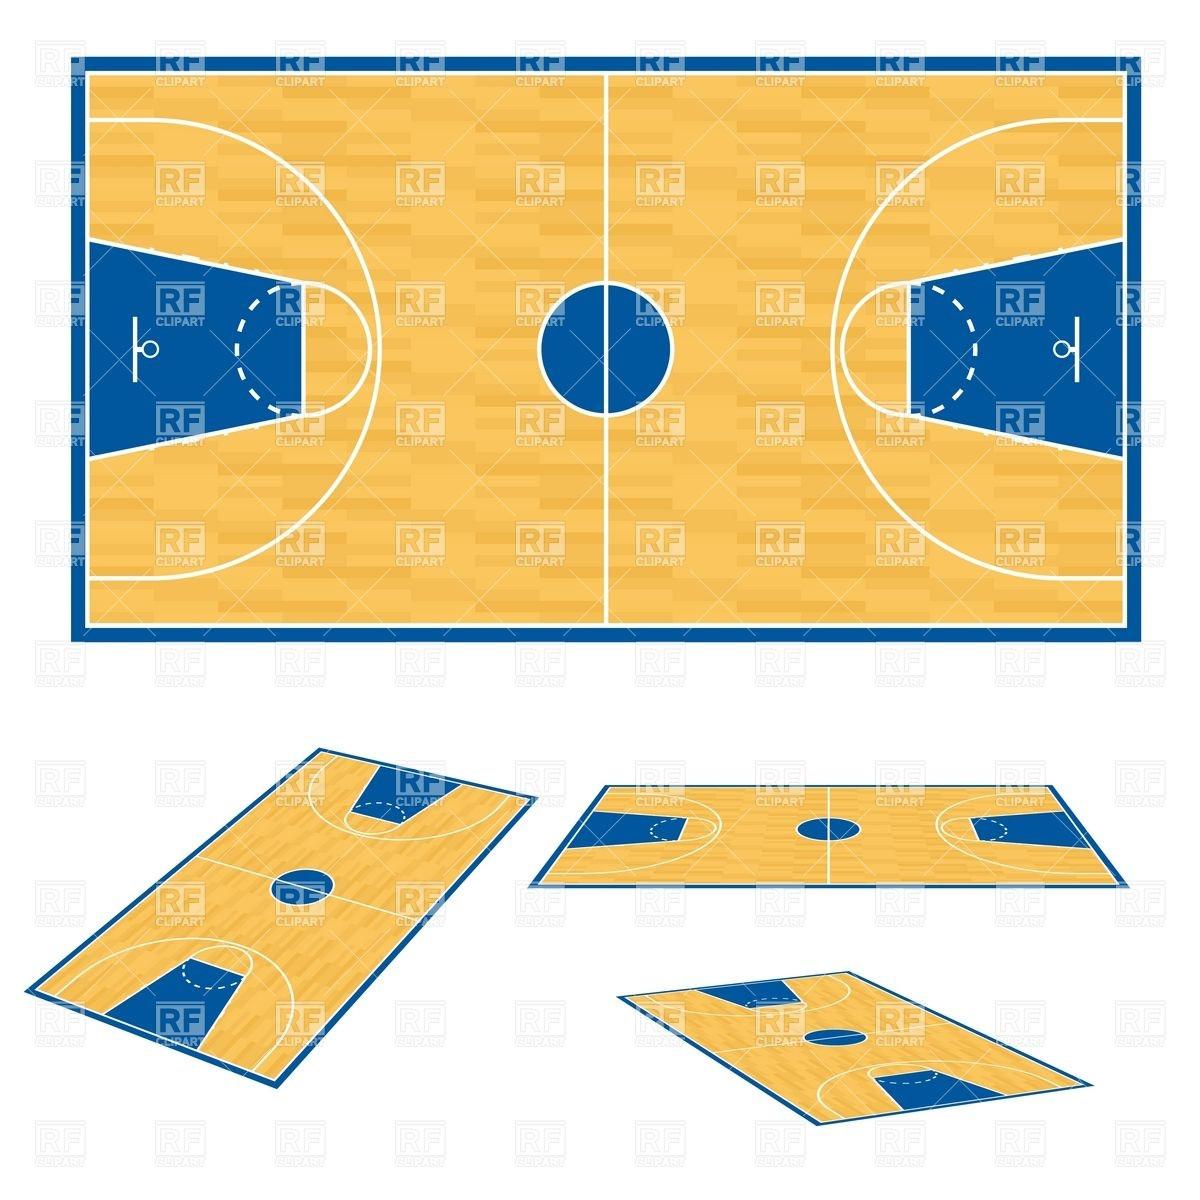 1200x1200 Basketball Court Floor Plan Royalty Free Vector Clip Art Image